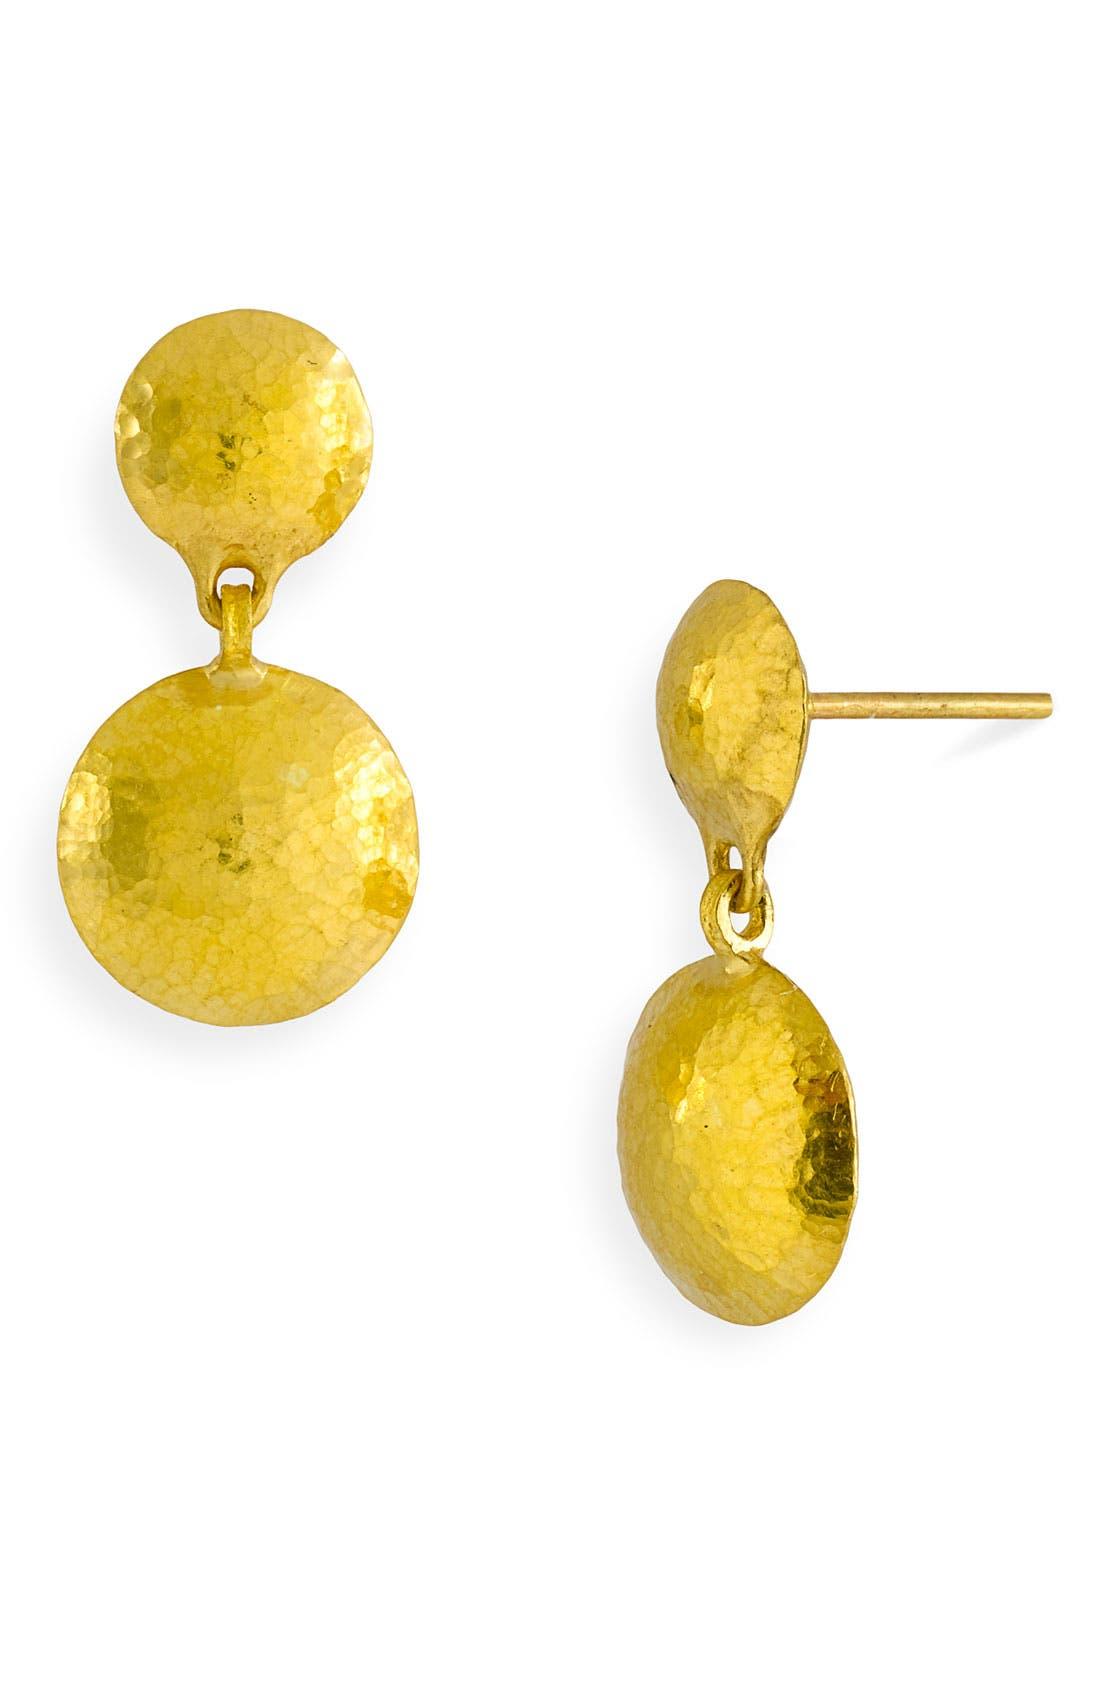 Main Image - Gurhan 'Lentil' Double Disc Drop Earrings